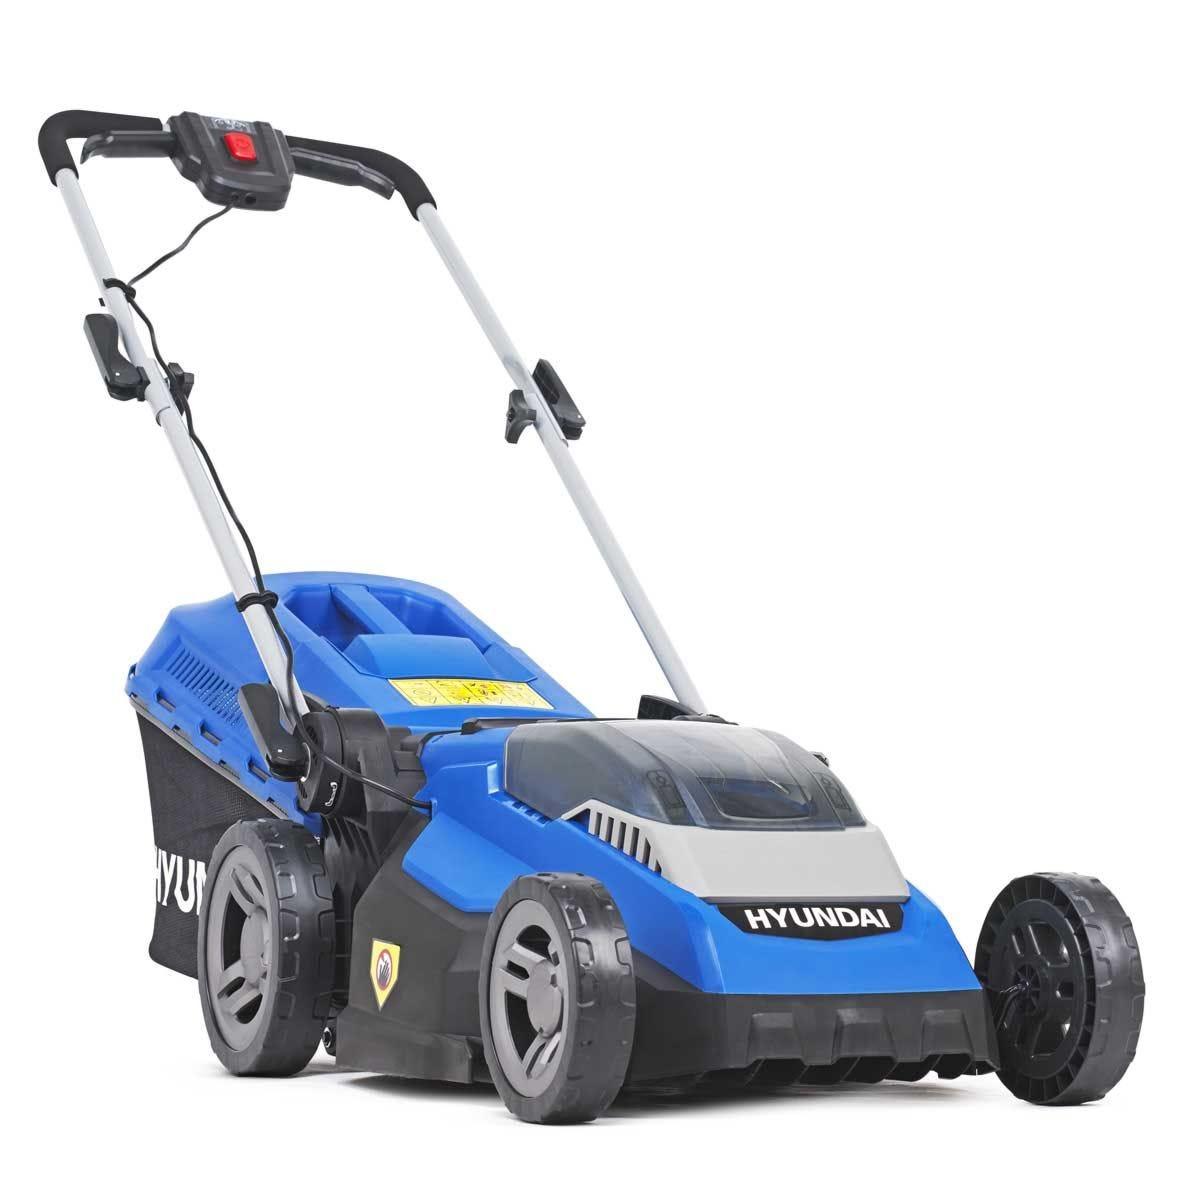 Hyundai HYM40LI380P 40v Rechargeable Lawn Mower